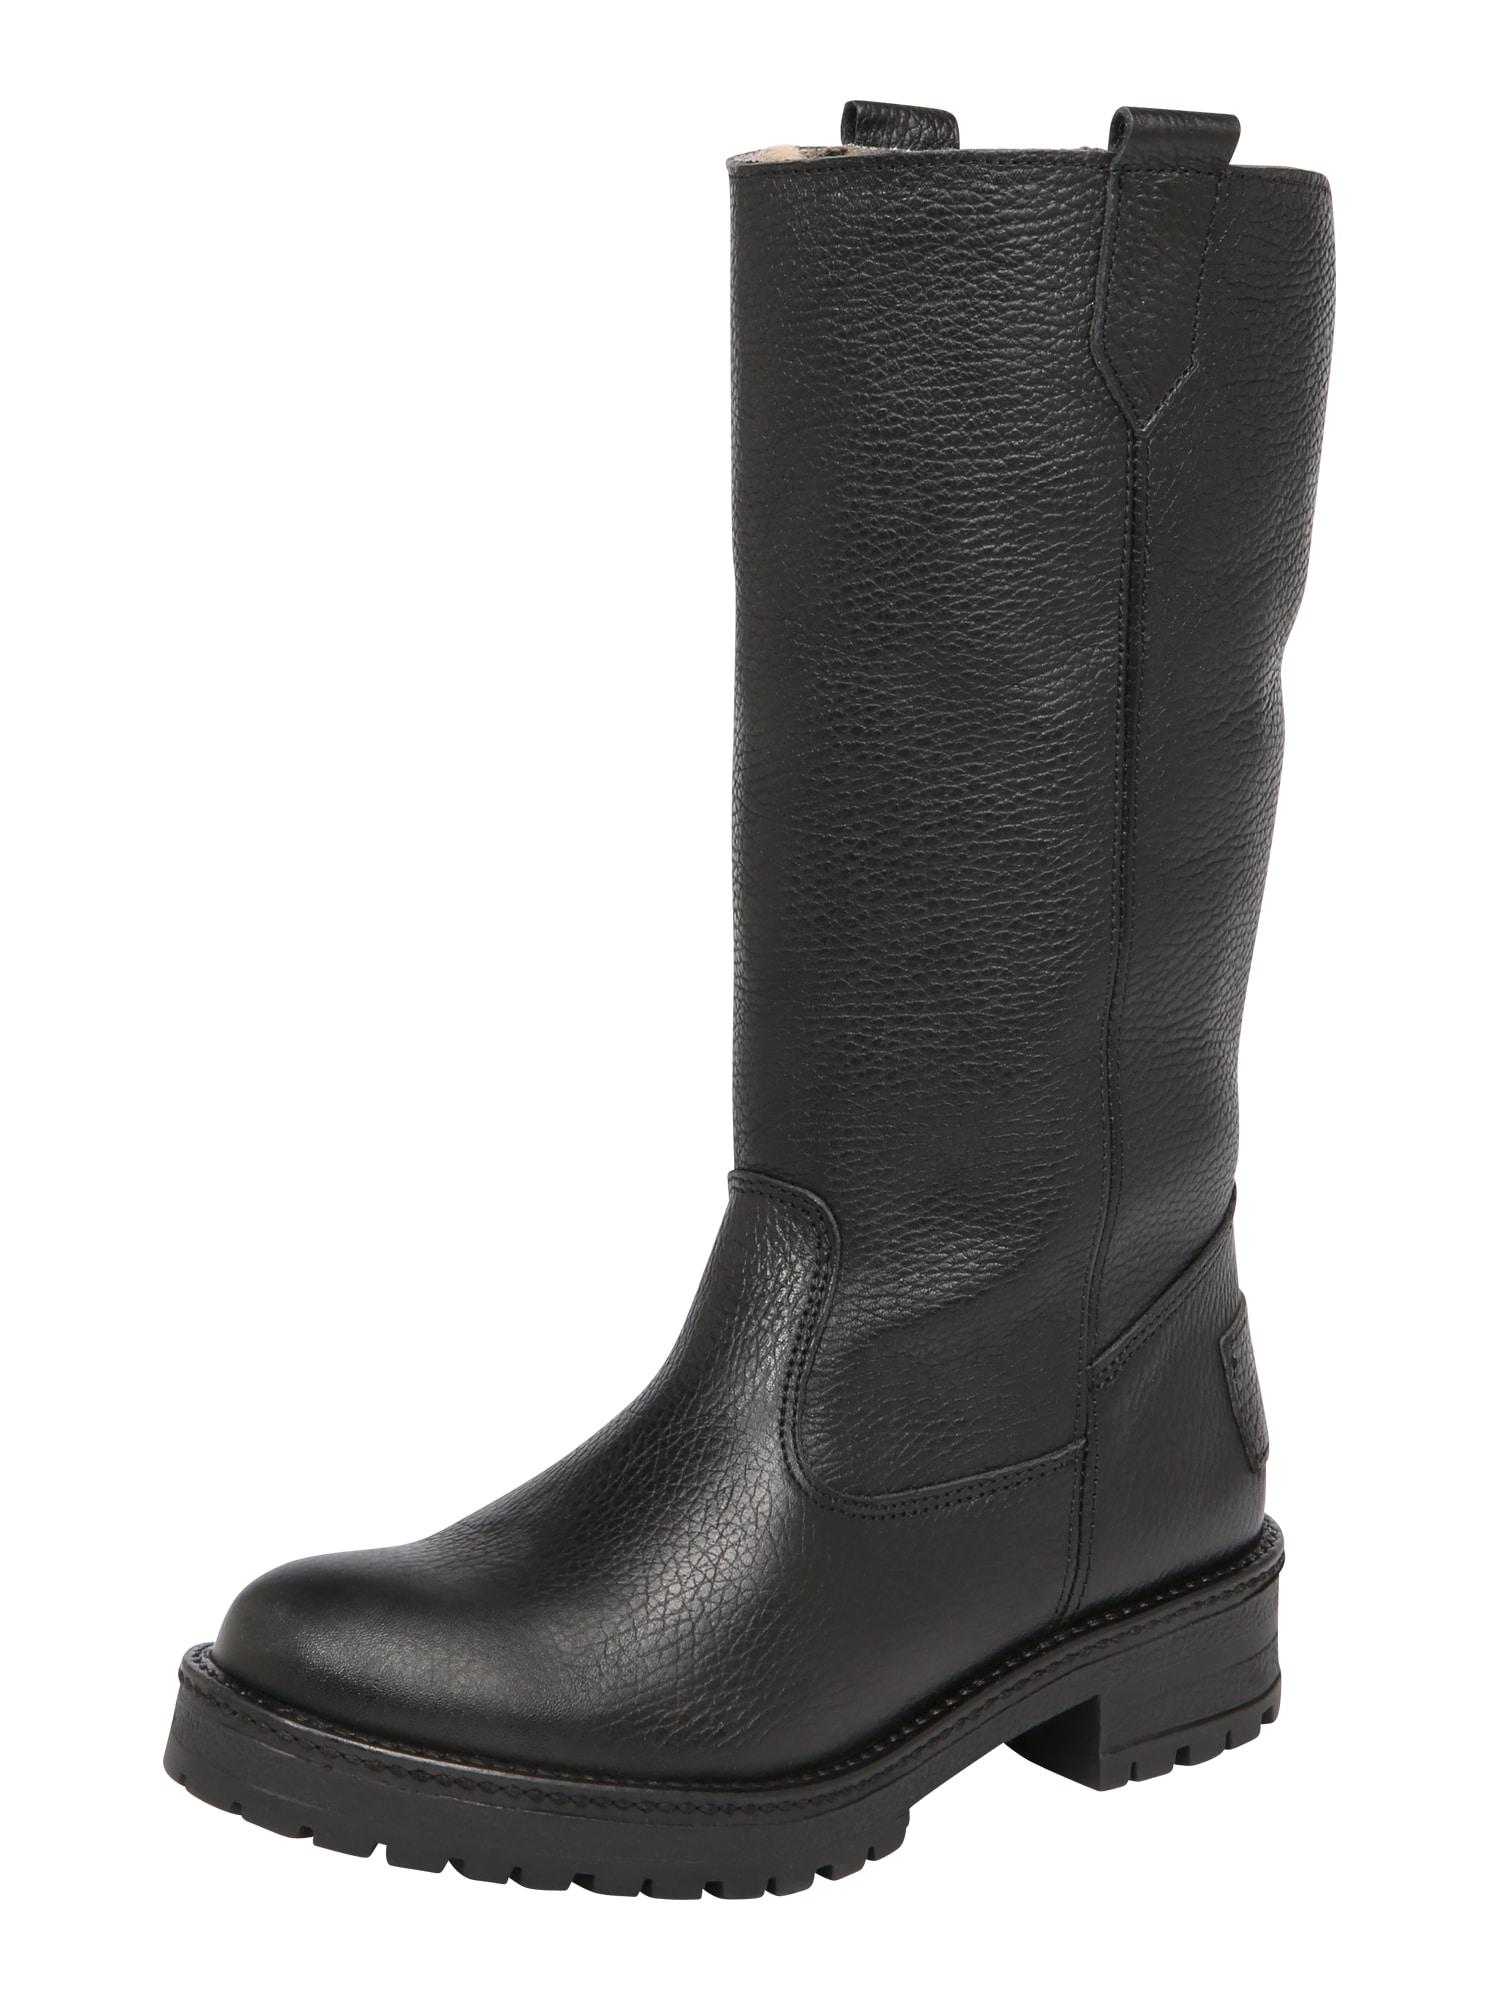 Boots | Schuhe > Boots > Sonstige Boots | Schwarz | BULLBOXER